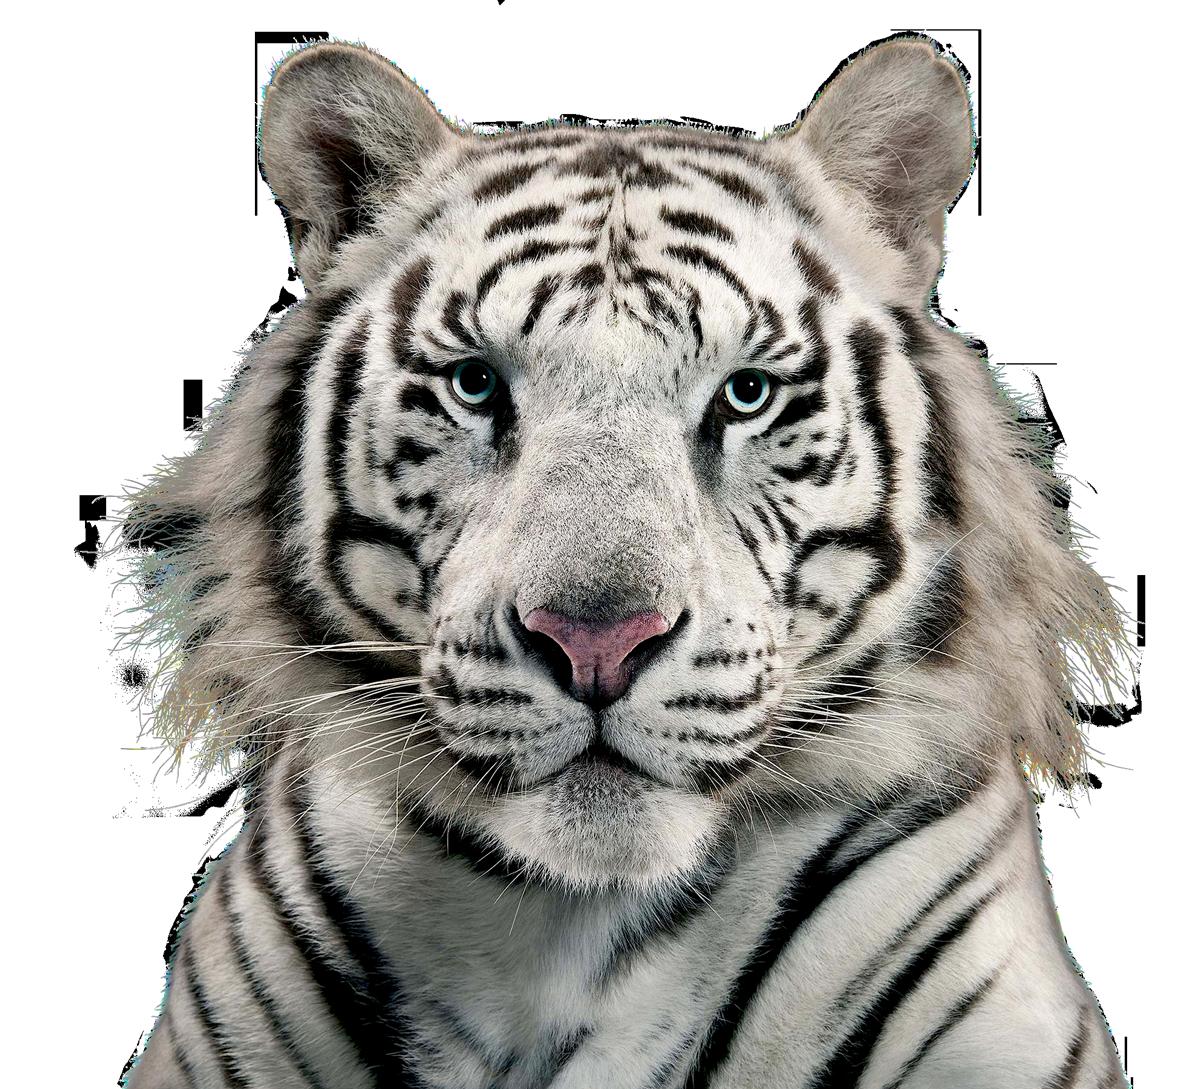 White Tiger Png Image White Tiger Tiger Images Tiger